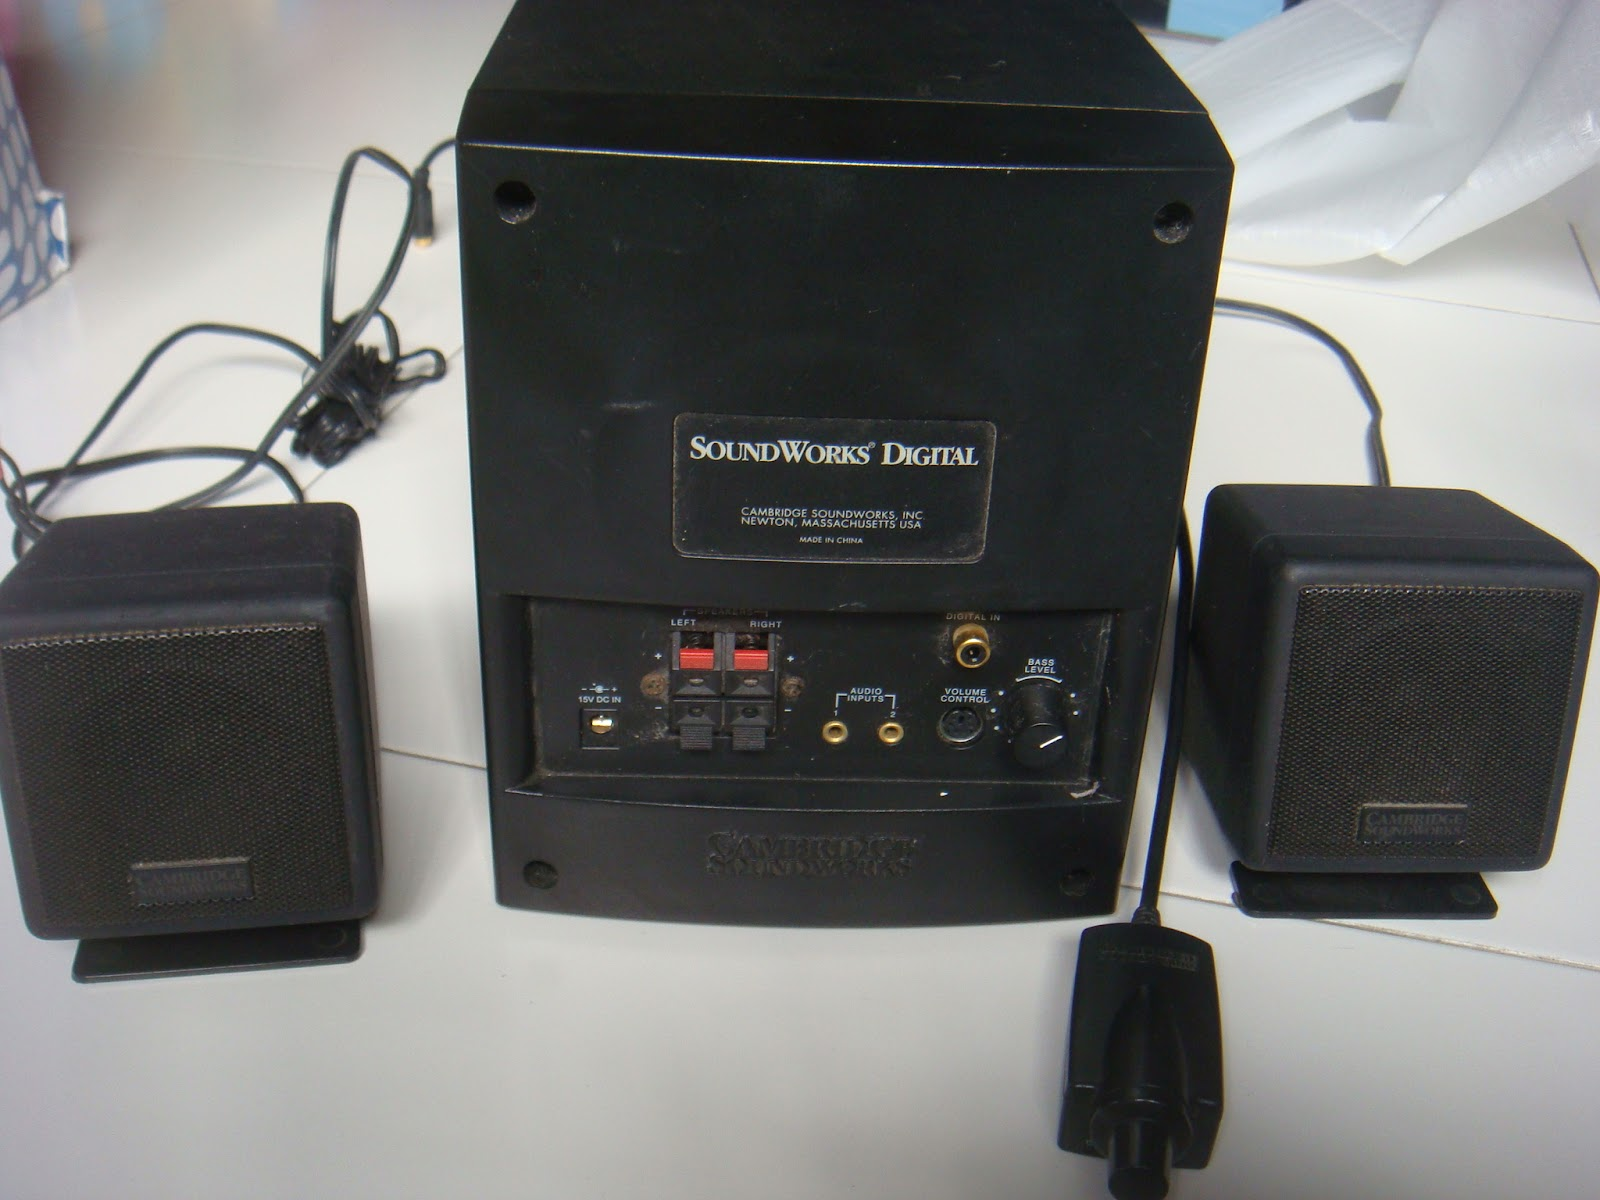 Pc Parts And Accessories Sitex 2012 Klipsch Promedia 2 1